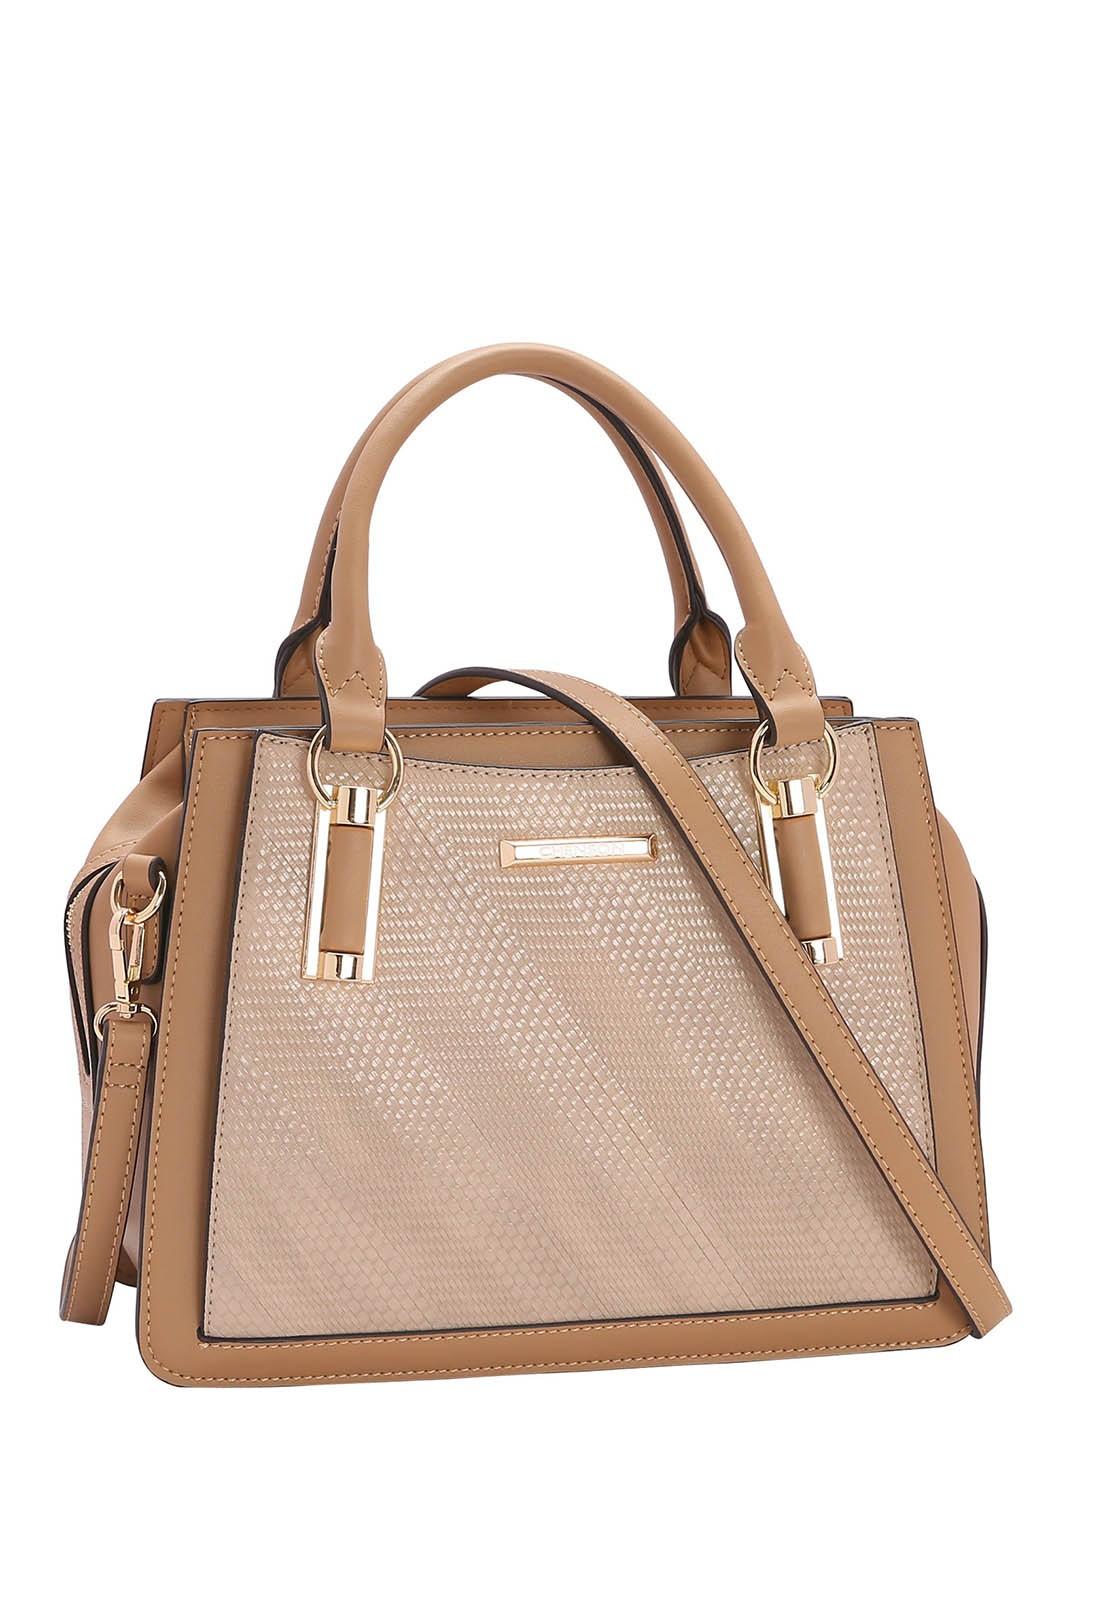 Bolsa Feminina Chenson Detalhe Xadrez de Mão 3482933